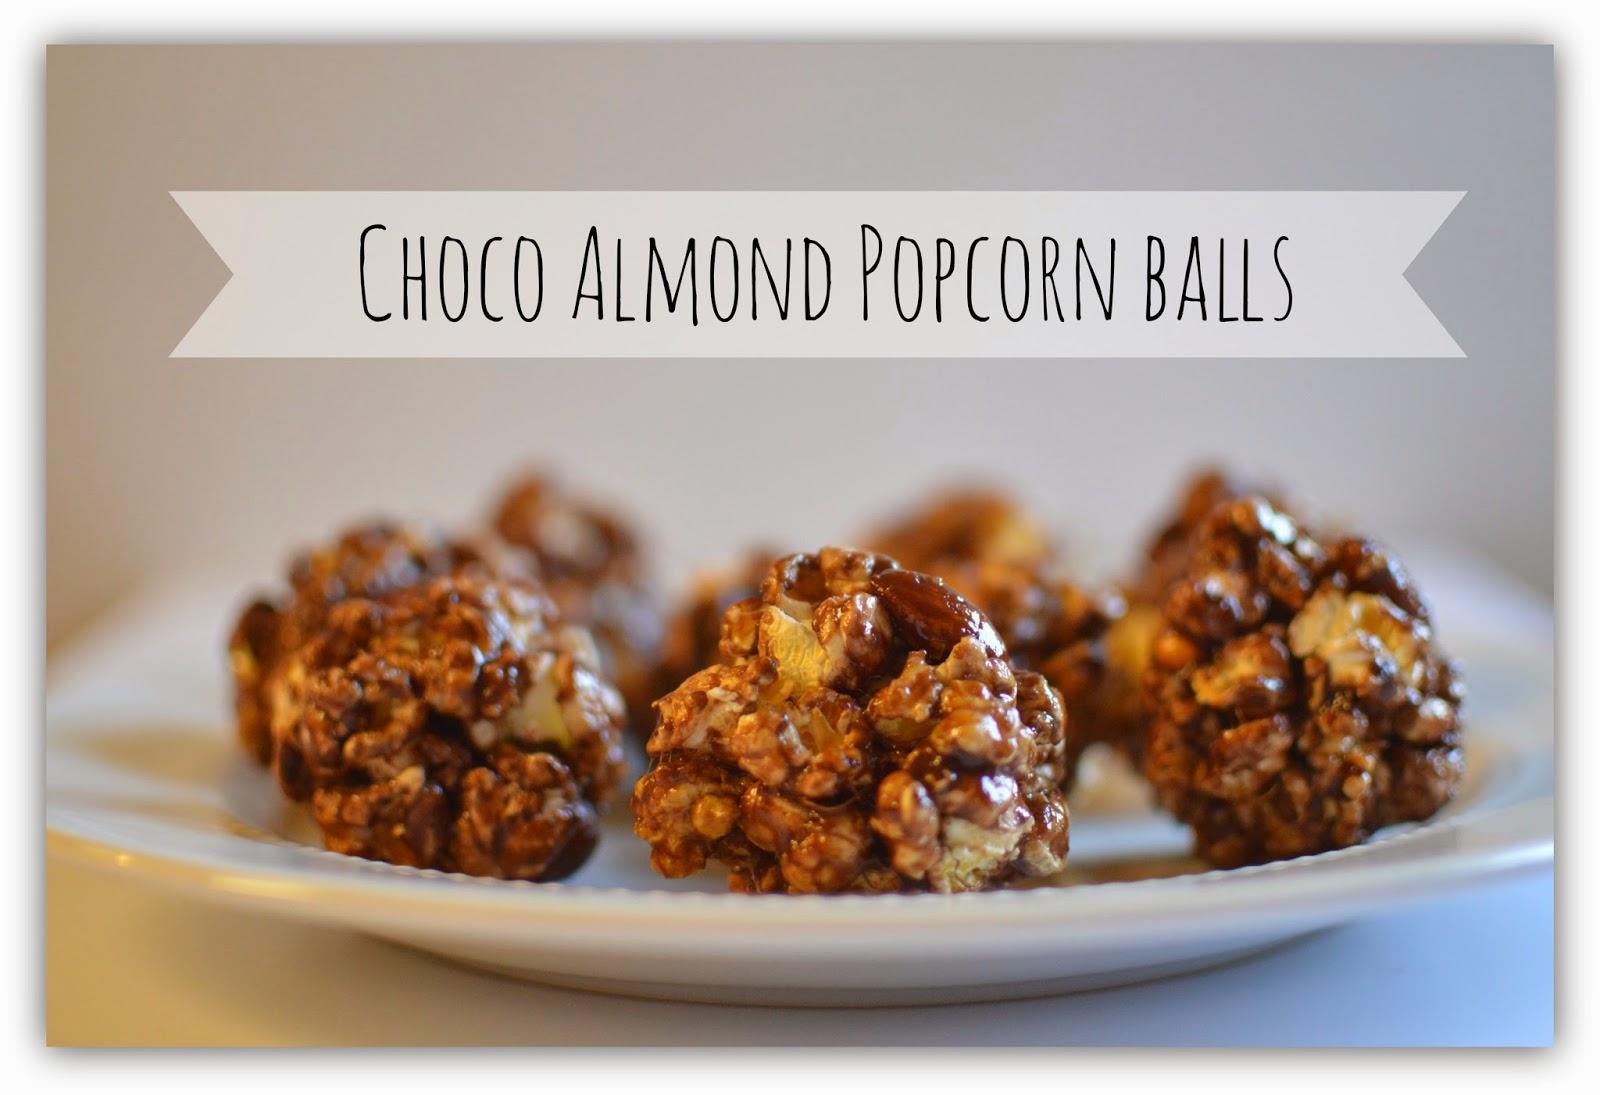 The Samantha Show: Choco Almond Popcorn Balls